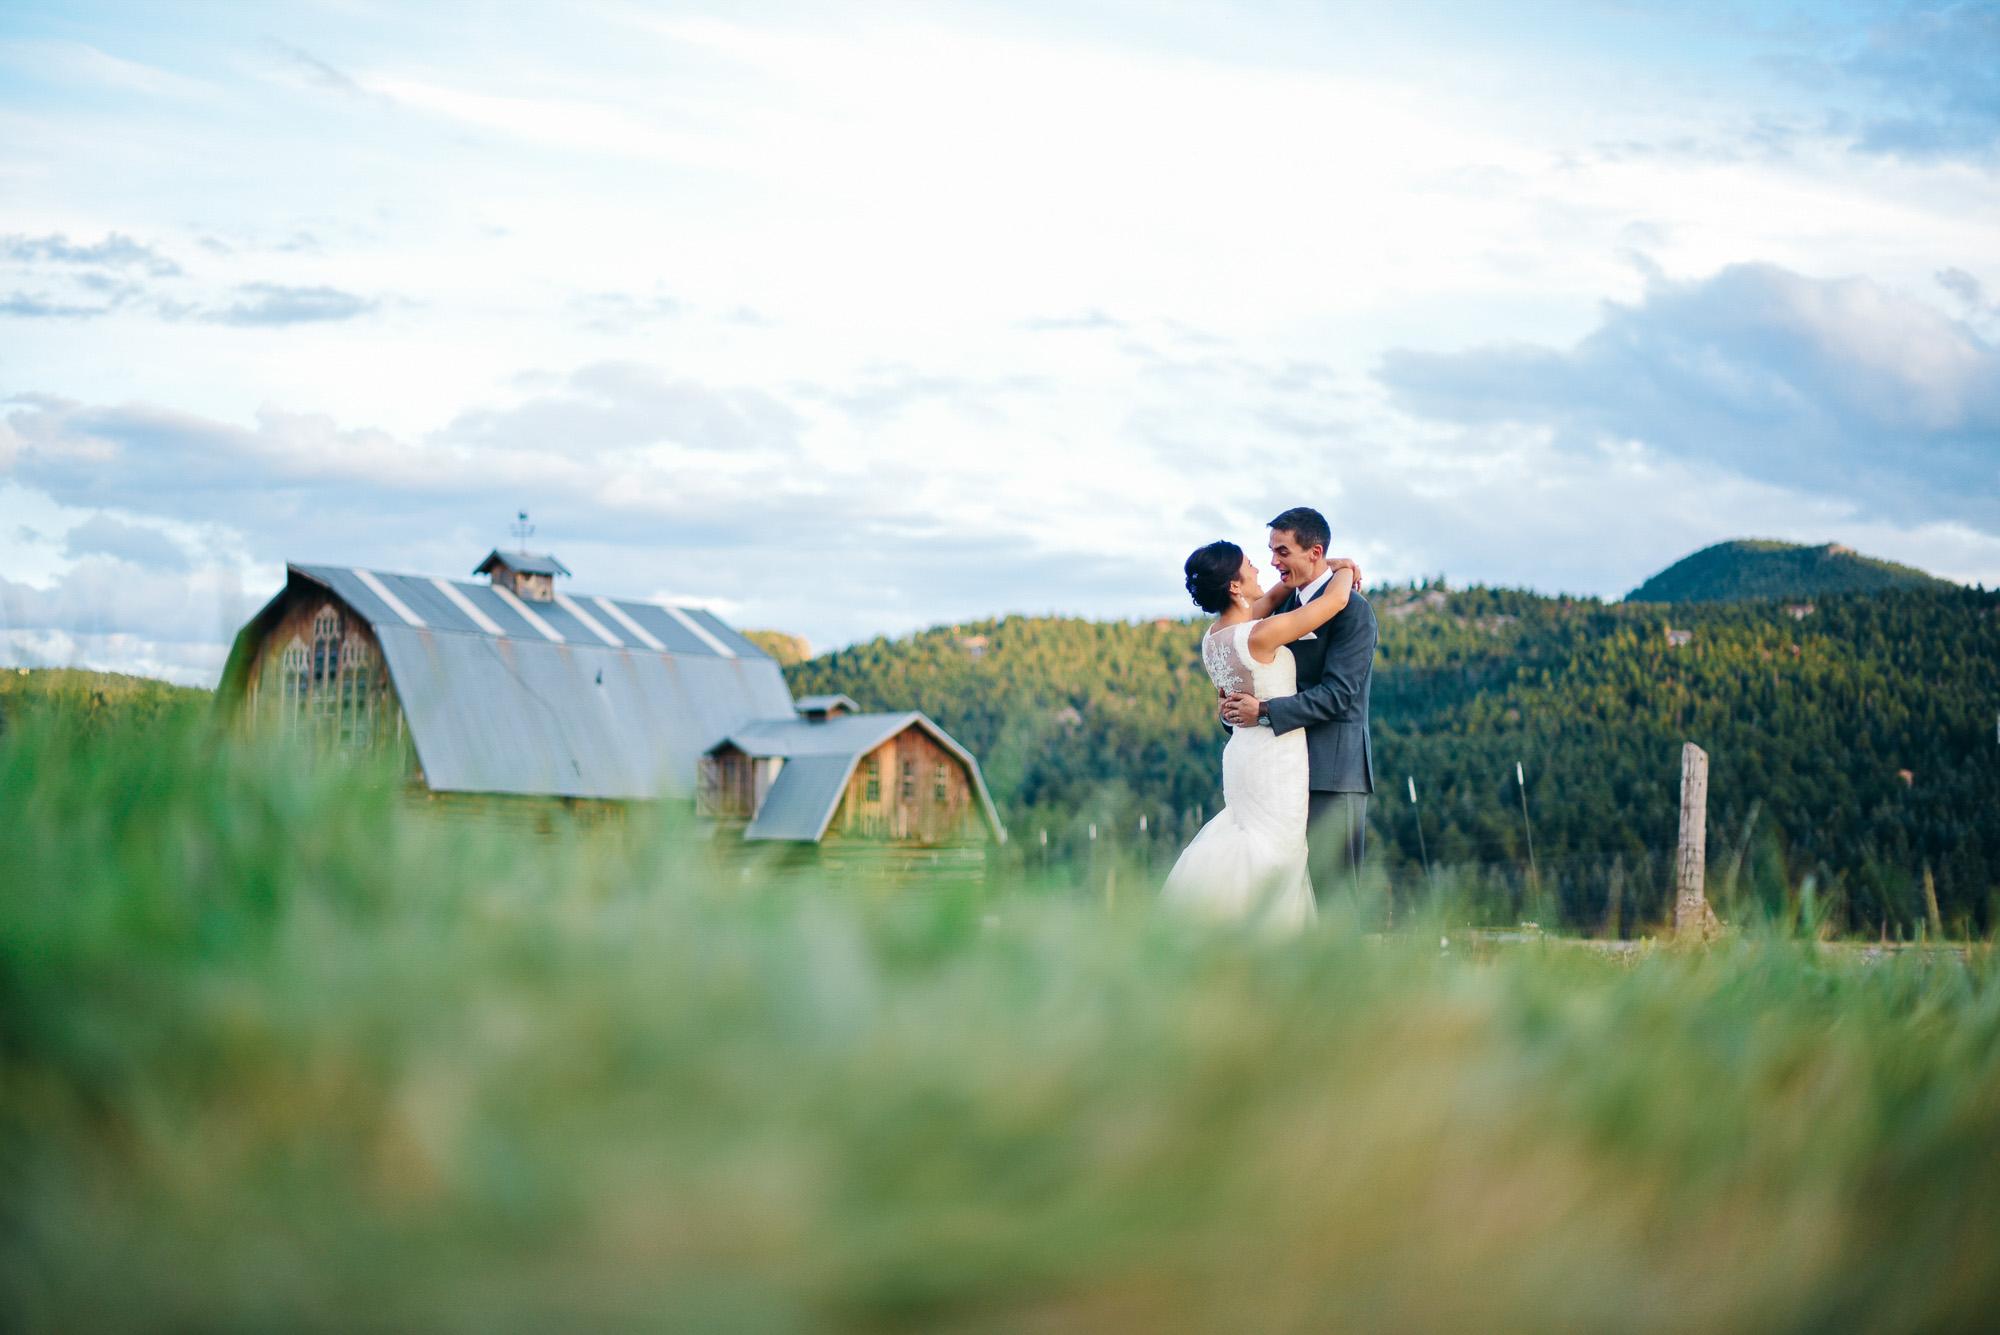 37elopement-photographer-colorado-evergreen_barn_wedding_photos_mountain_wedding_photographer_courtney&kirby_4016.jpg